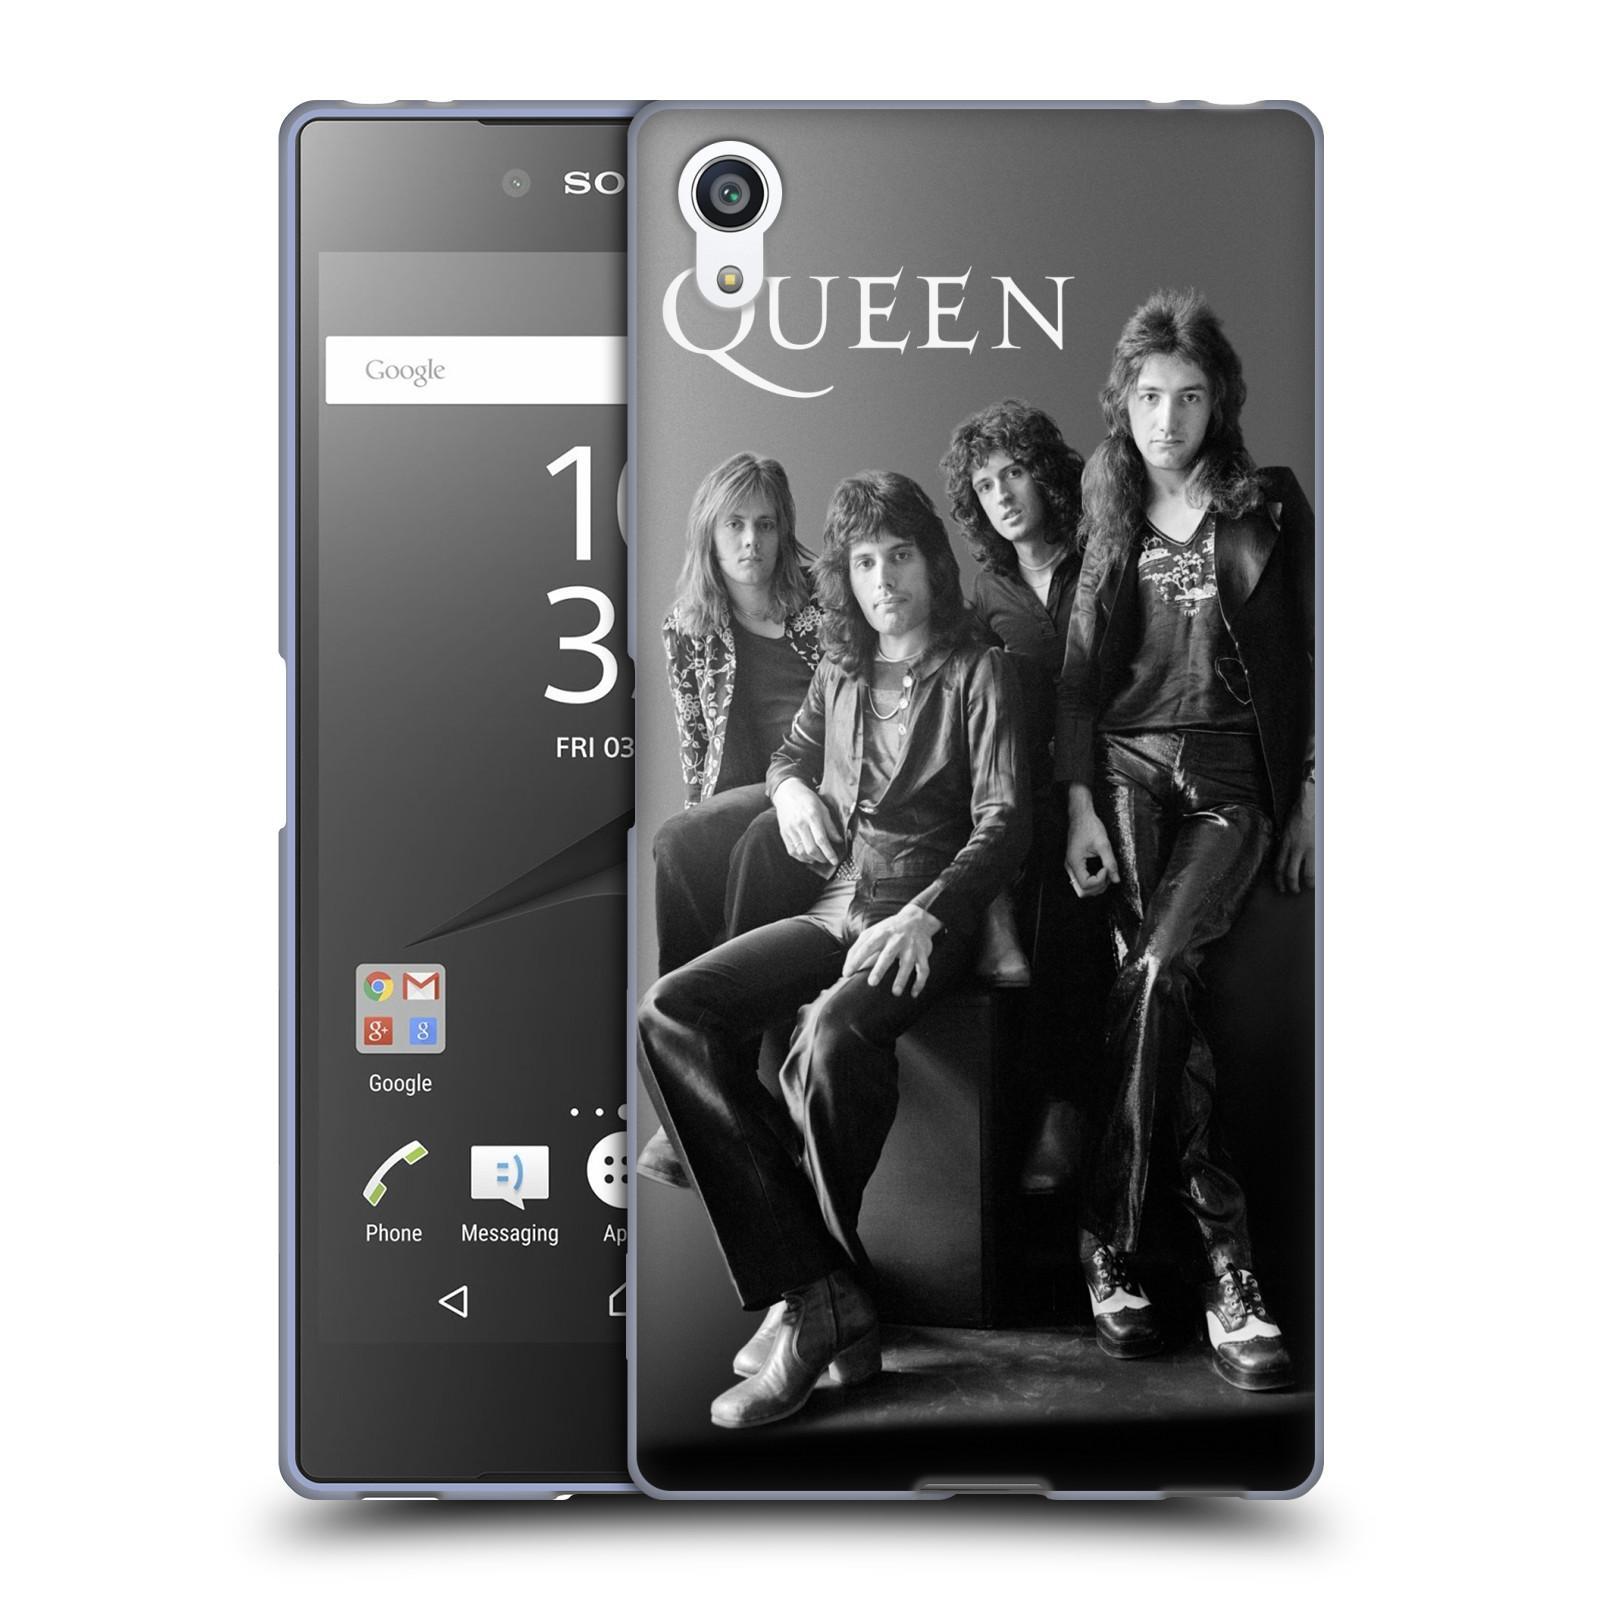 Silikonové pouzdro na mobil Sony Xperia Z5 Premium HEAD CASE Queen - Skupina